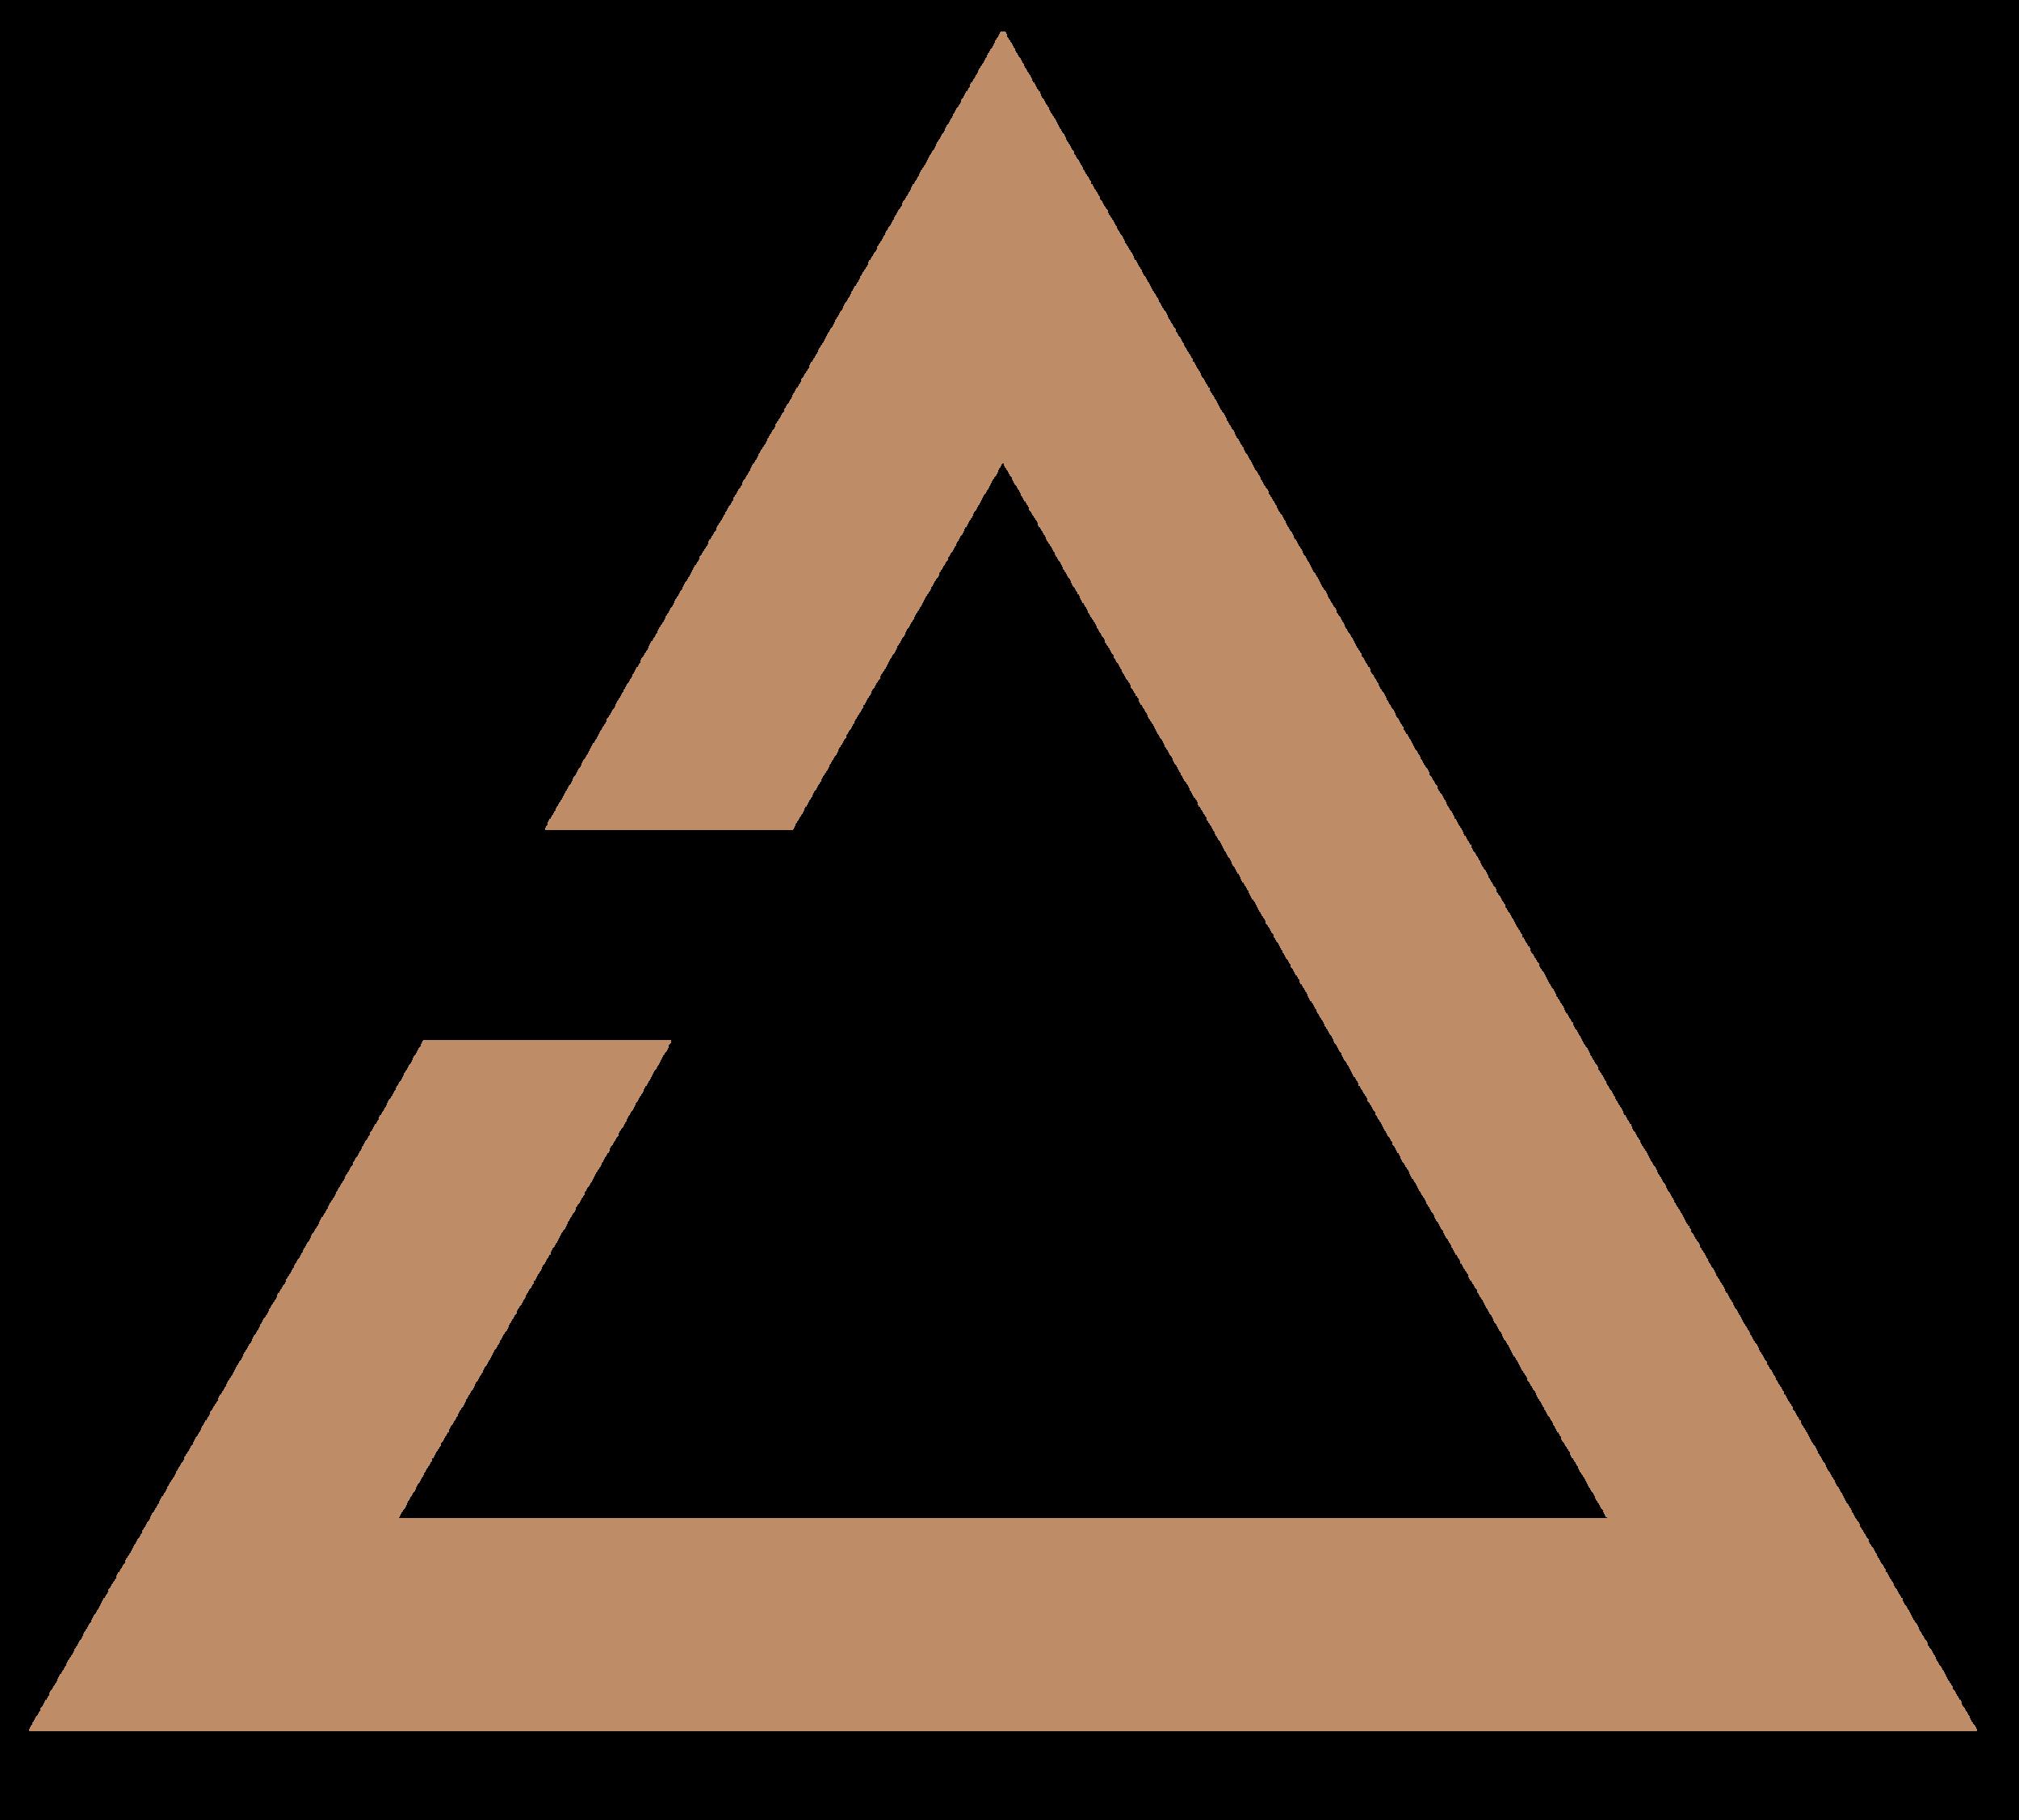 path-law-logo-icon-reva.png